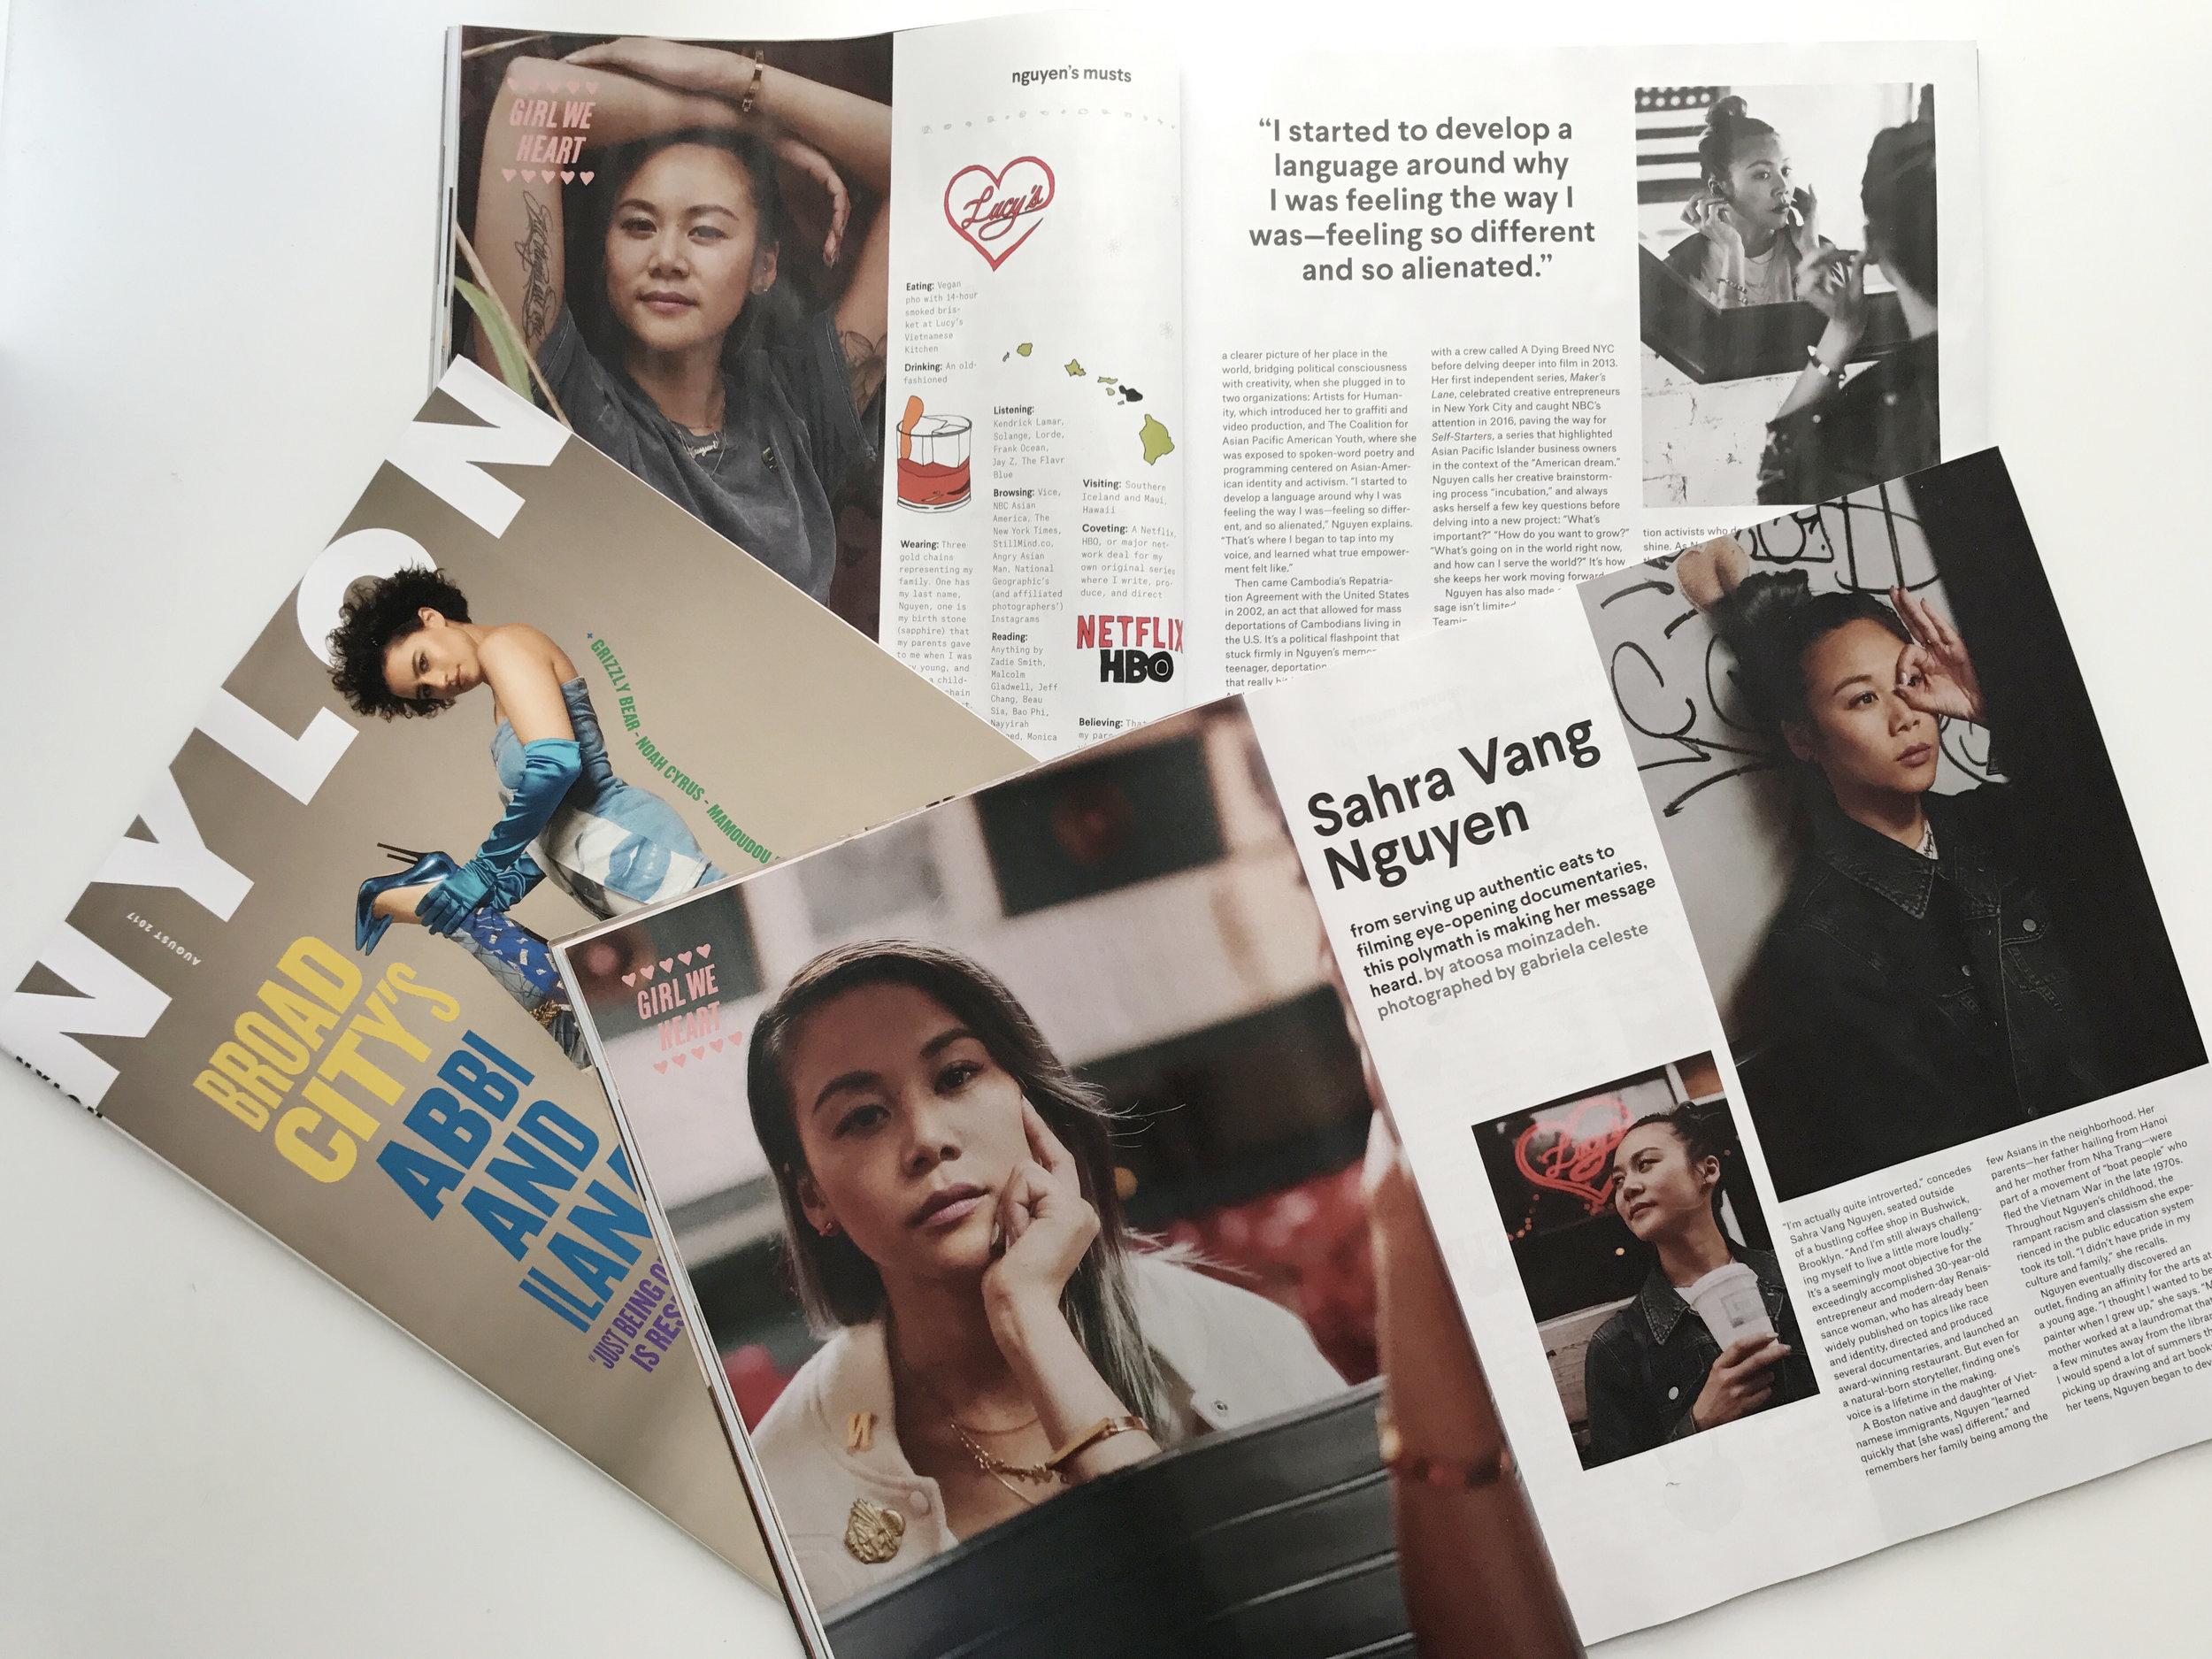 sahra nguyen nylon magazine renaissance woman